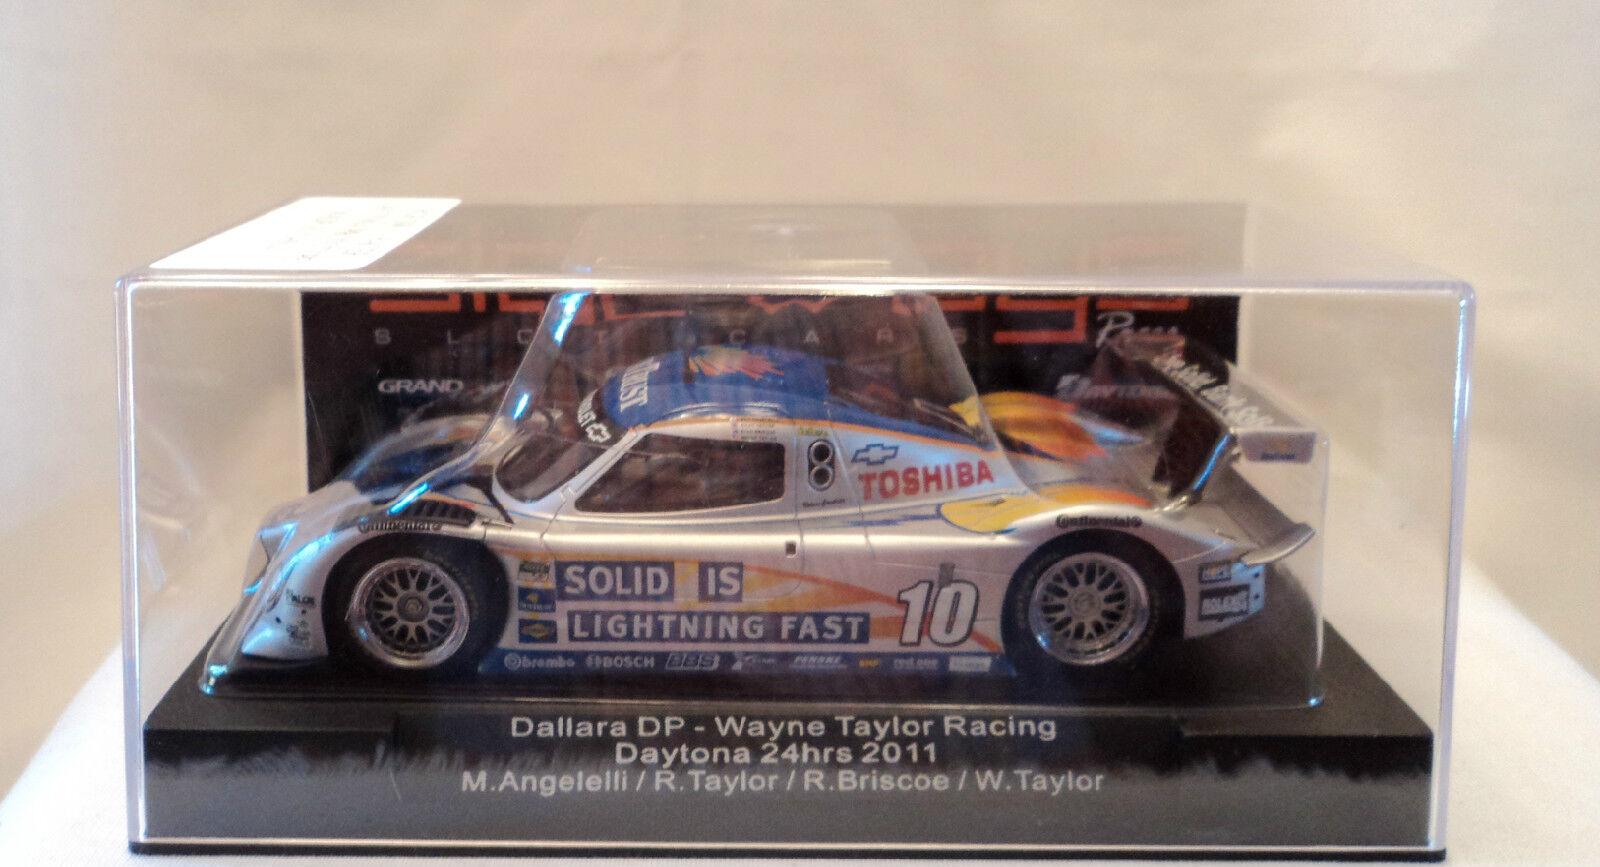 Racer seitwärts dallara wayne taylor - 1   32 sw11 slot car